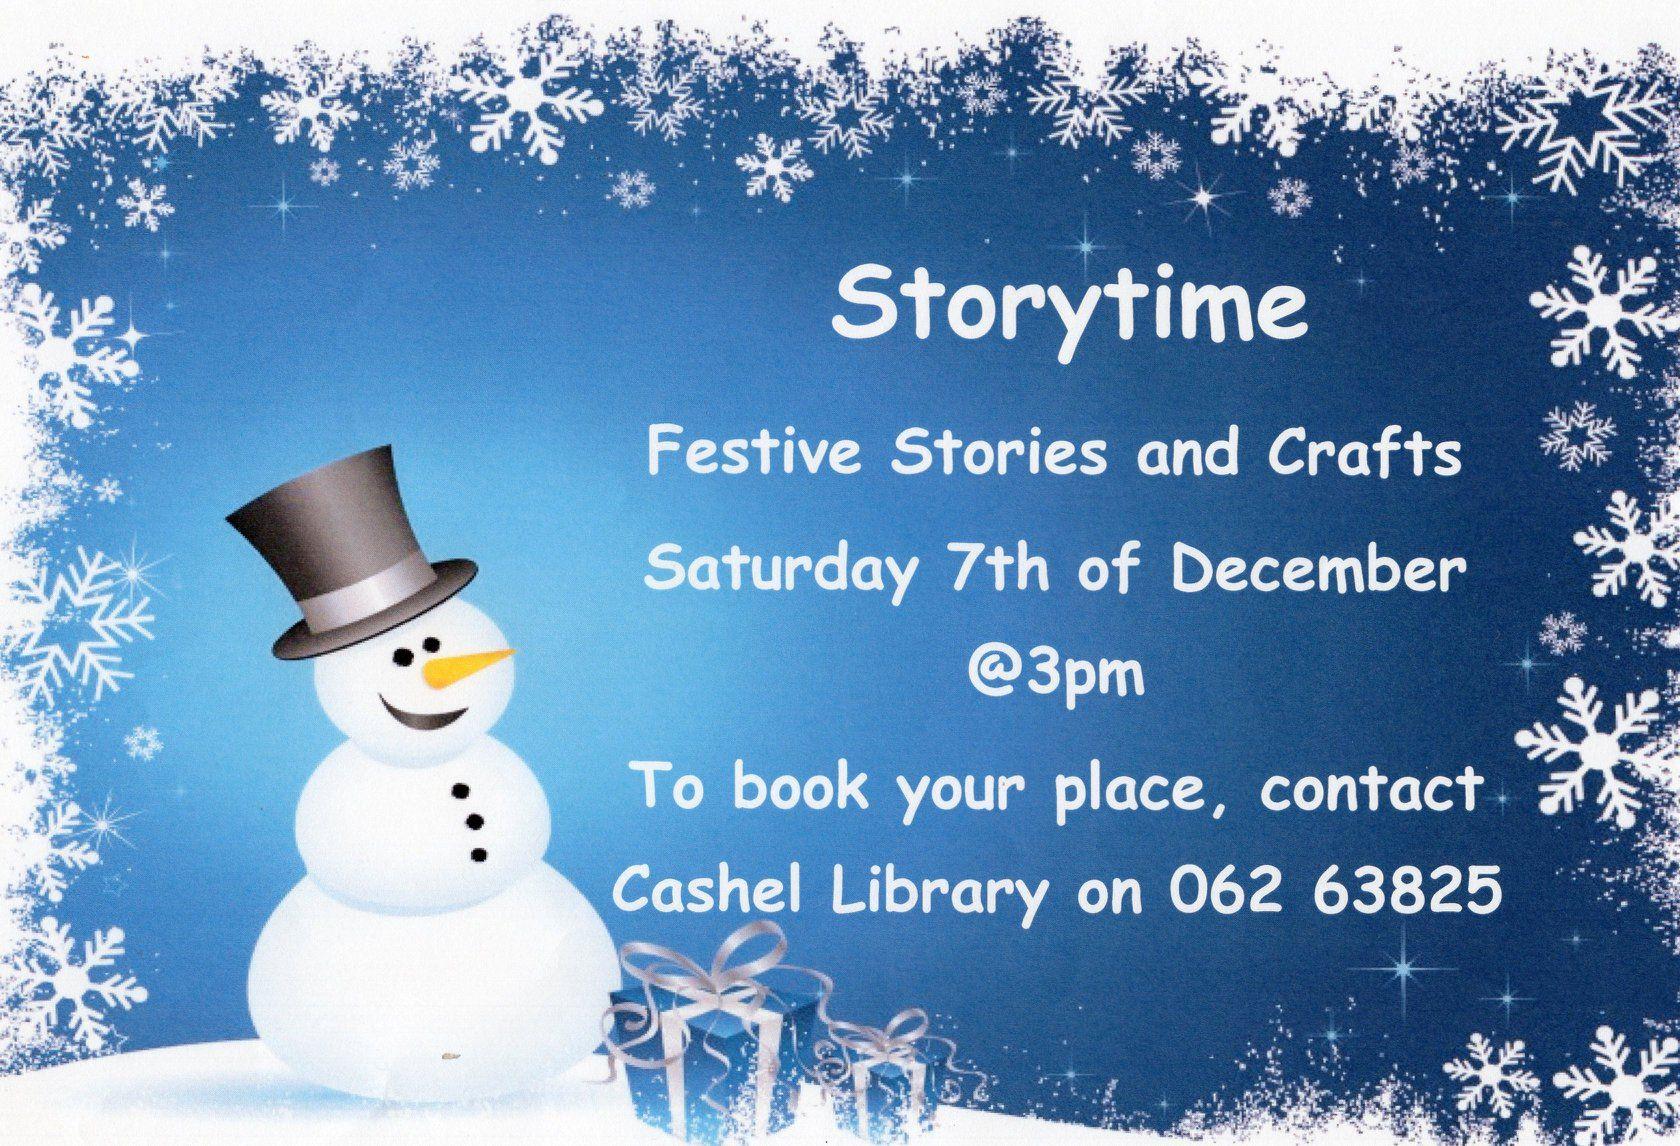 Cashel: Festive Storytime December 7th At 3pm